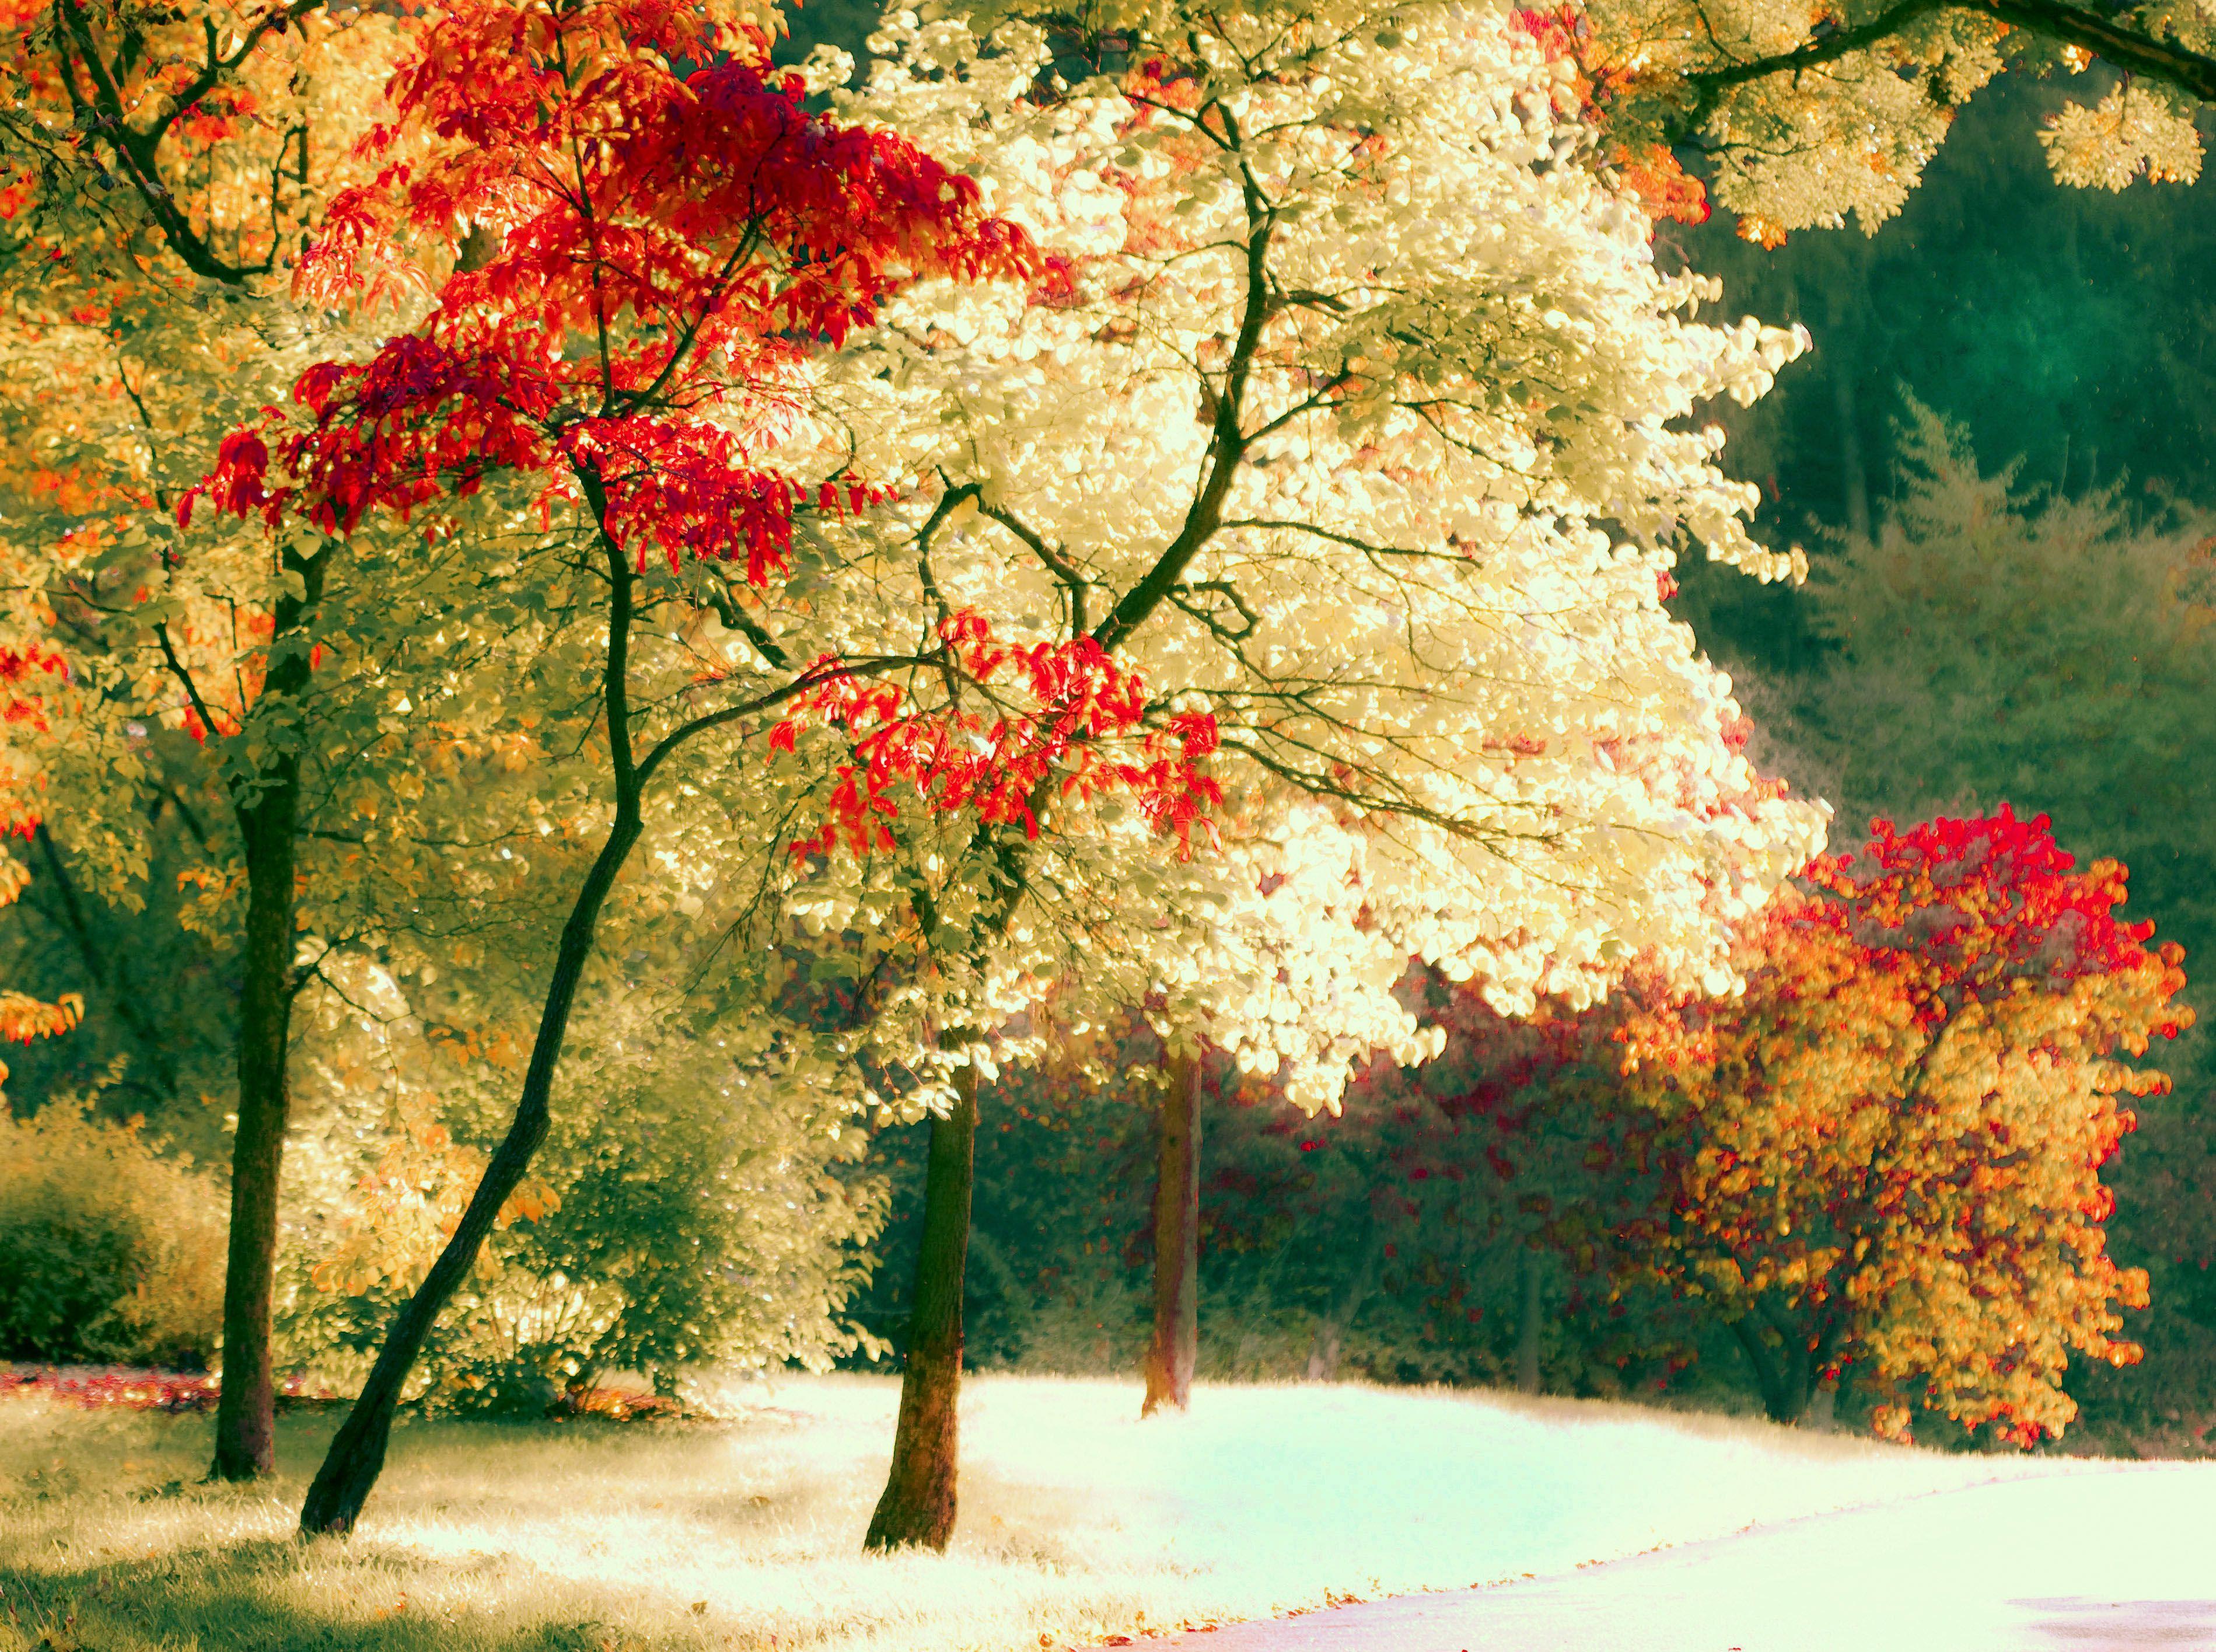 Free Best woodstock x HD Desktop Wallpapers and